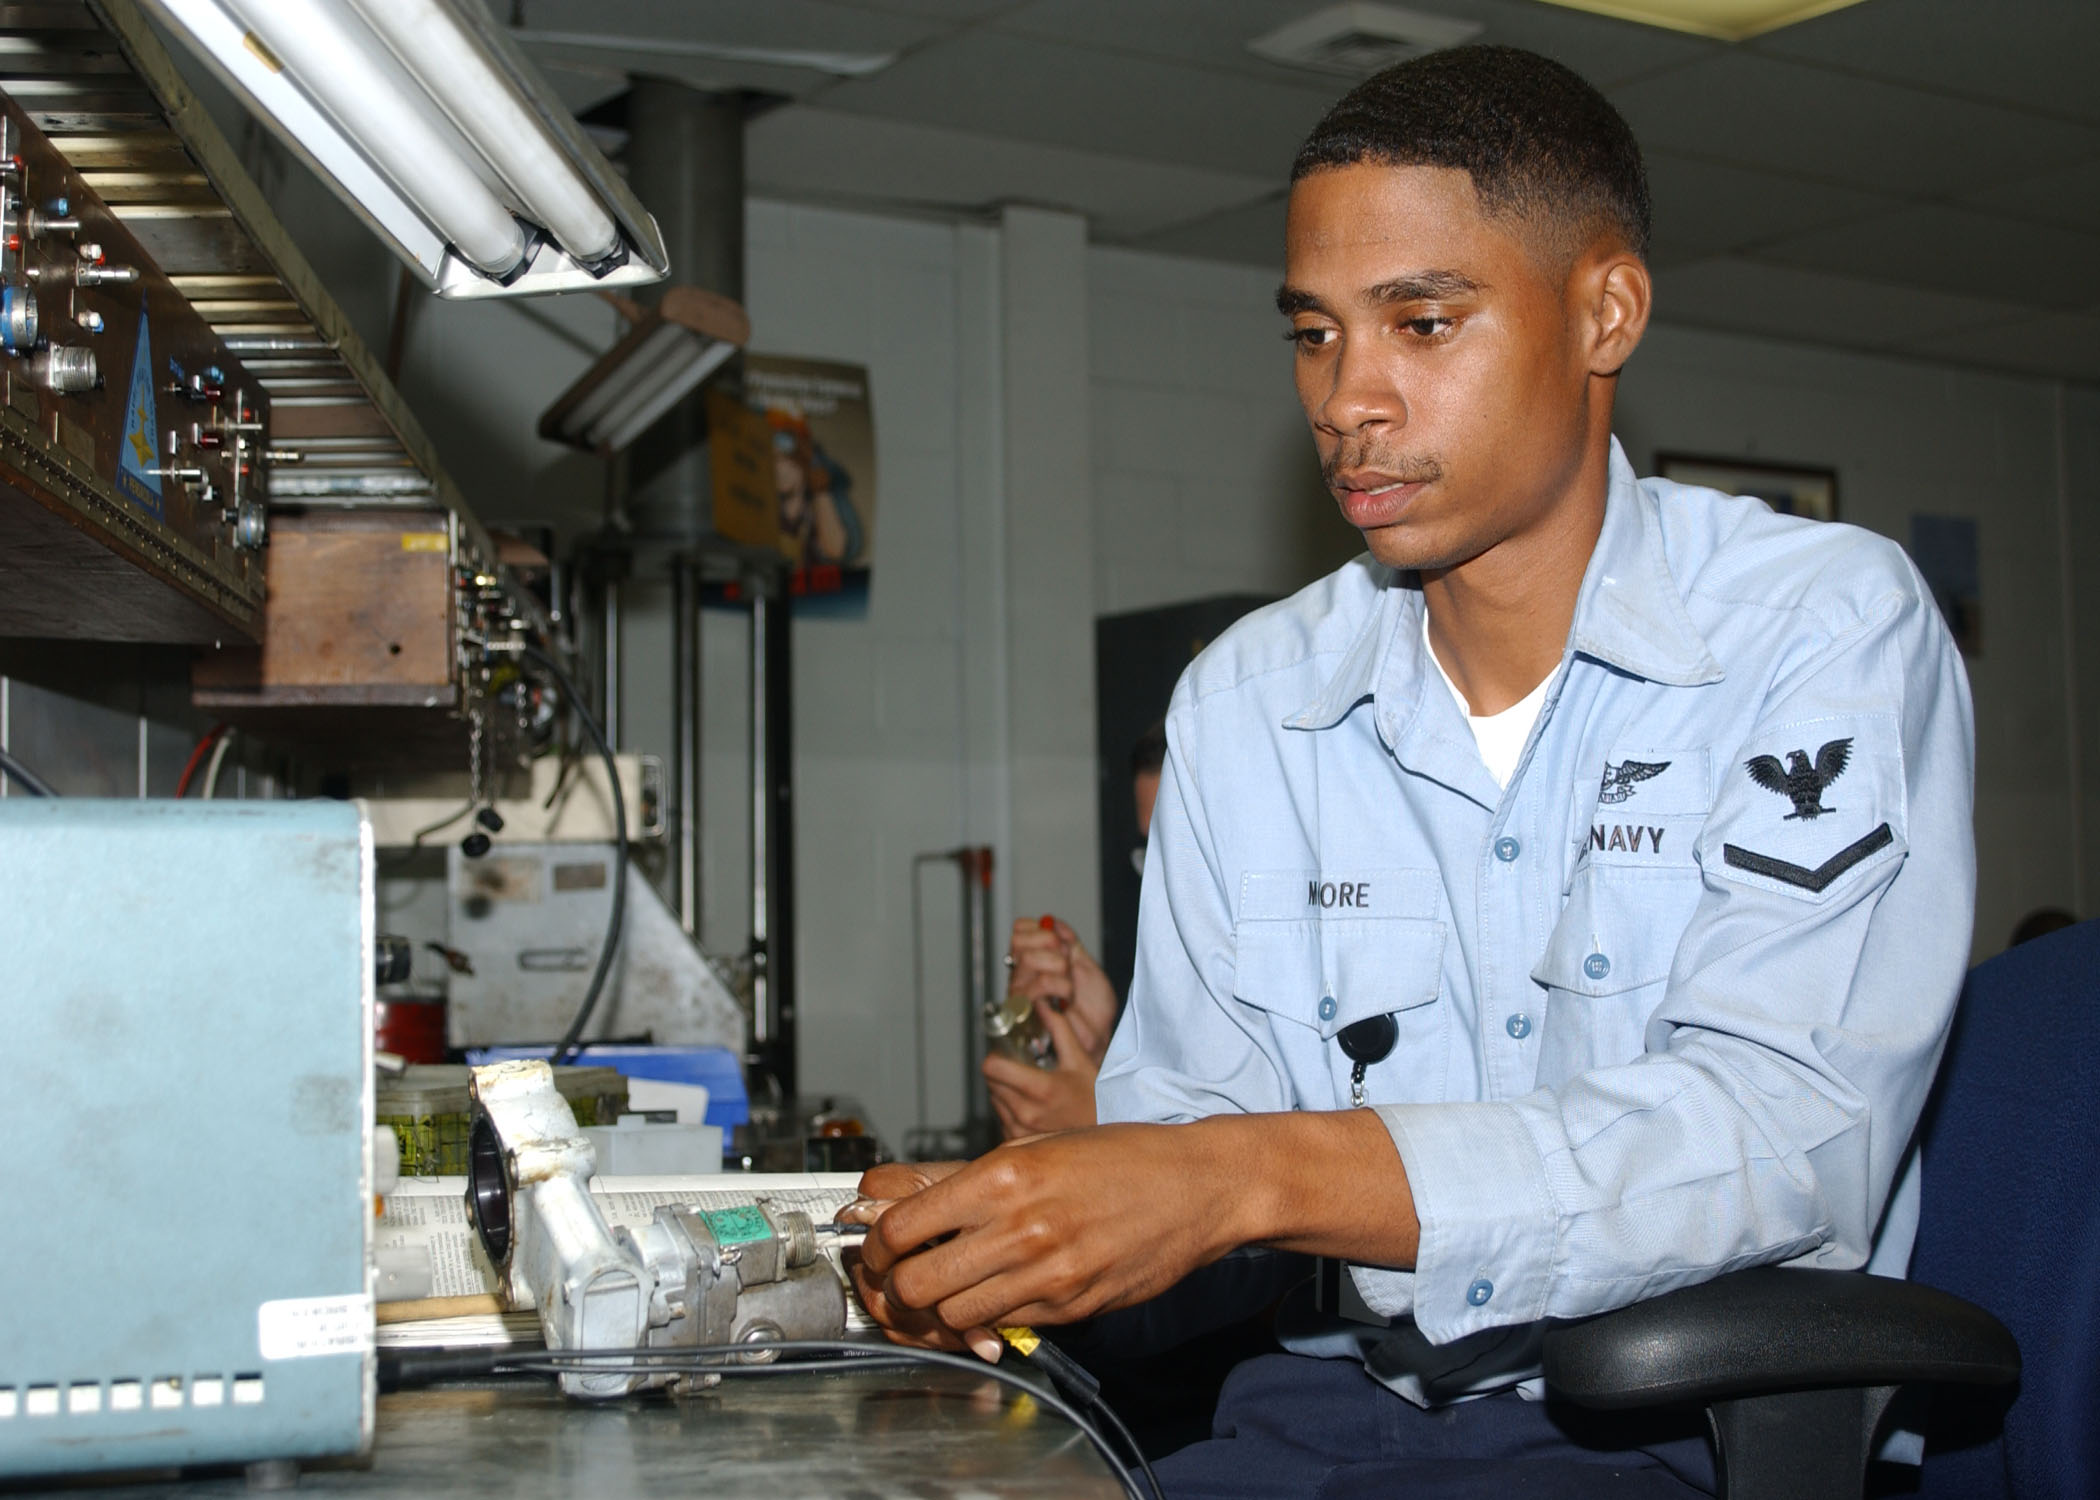 File:US Navy 030618-N-3970R-013 Aviation Electrician Technician ...